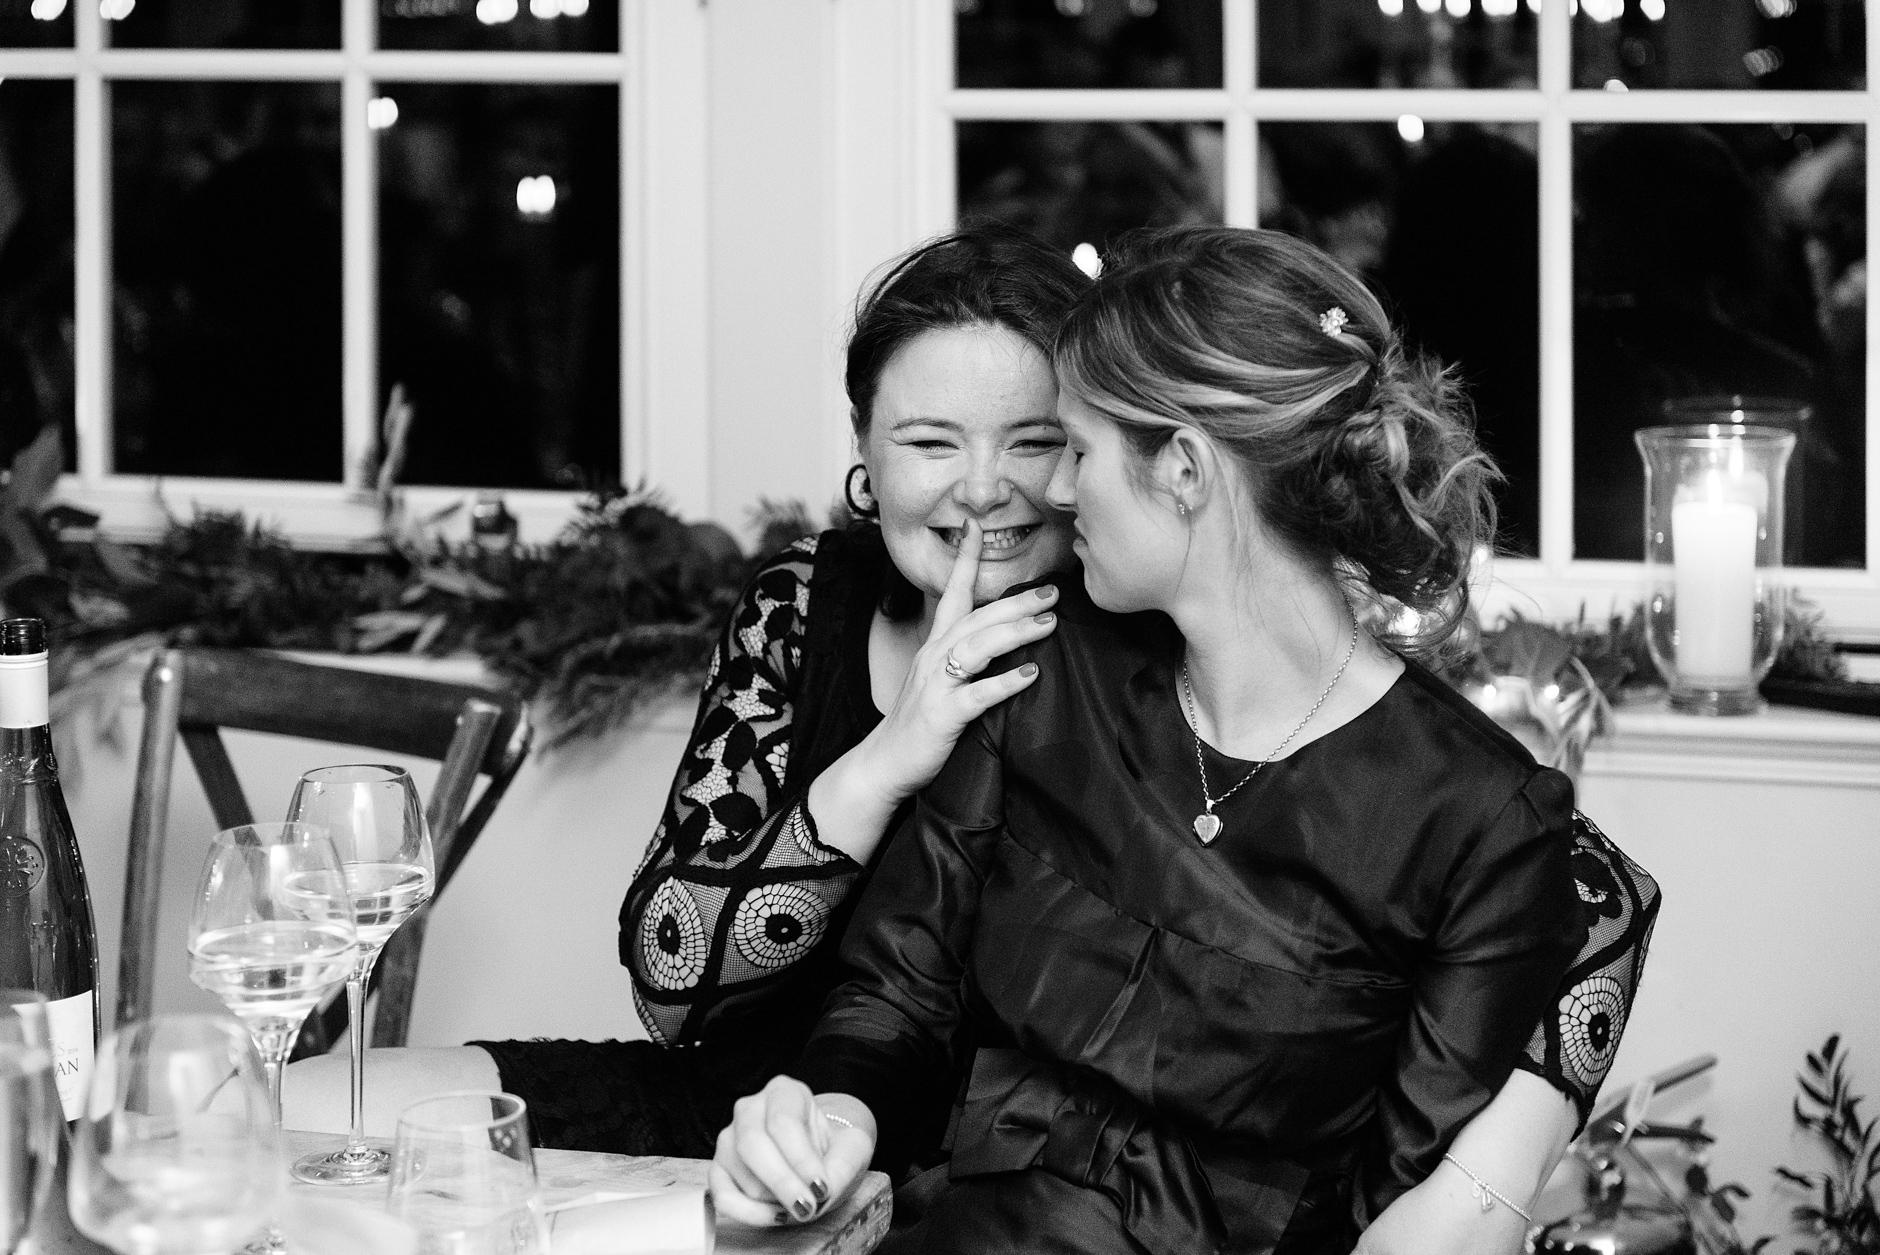 Glentruim-Wedding-Nikki-Leadbetter-Photography-329.jpg